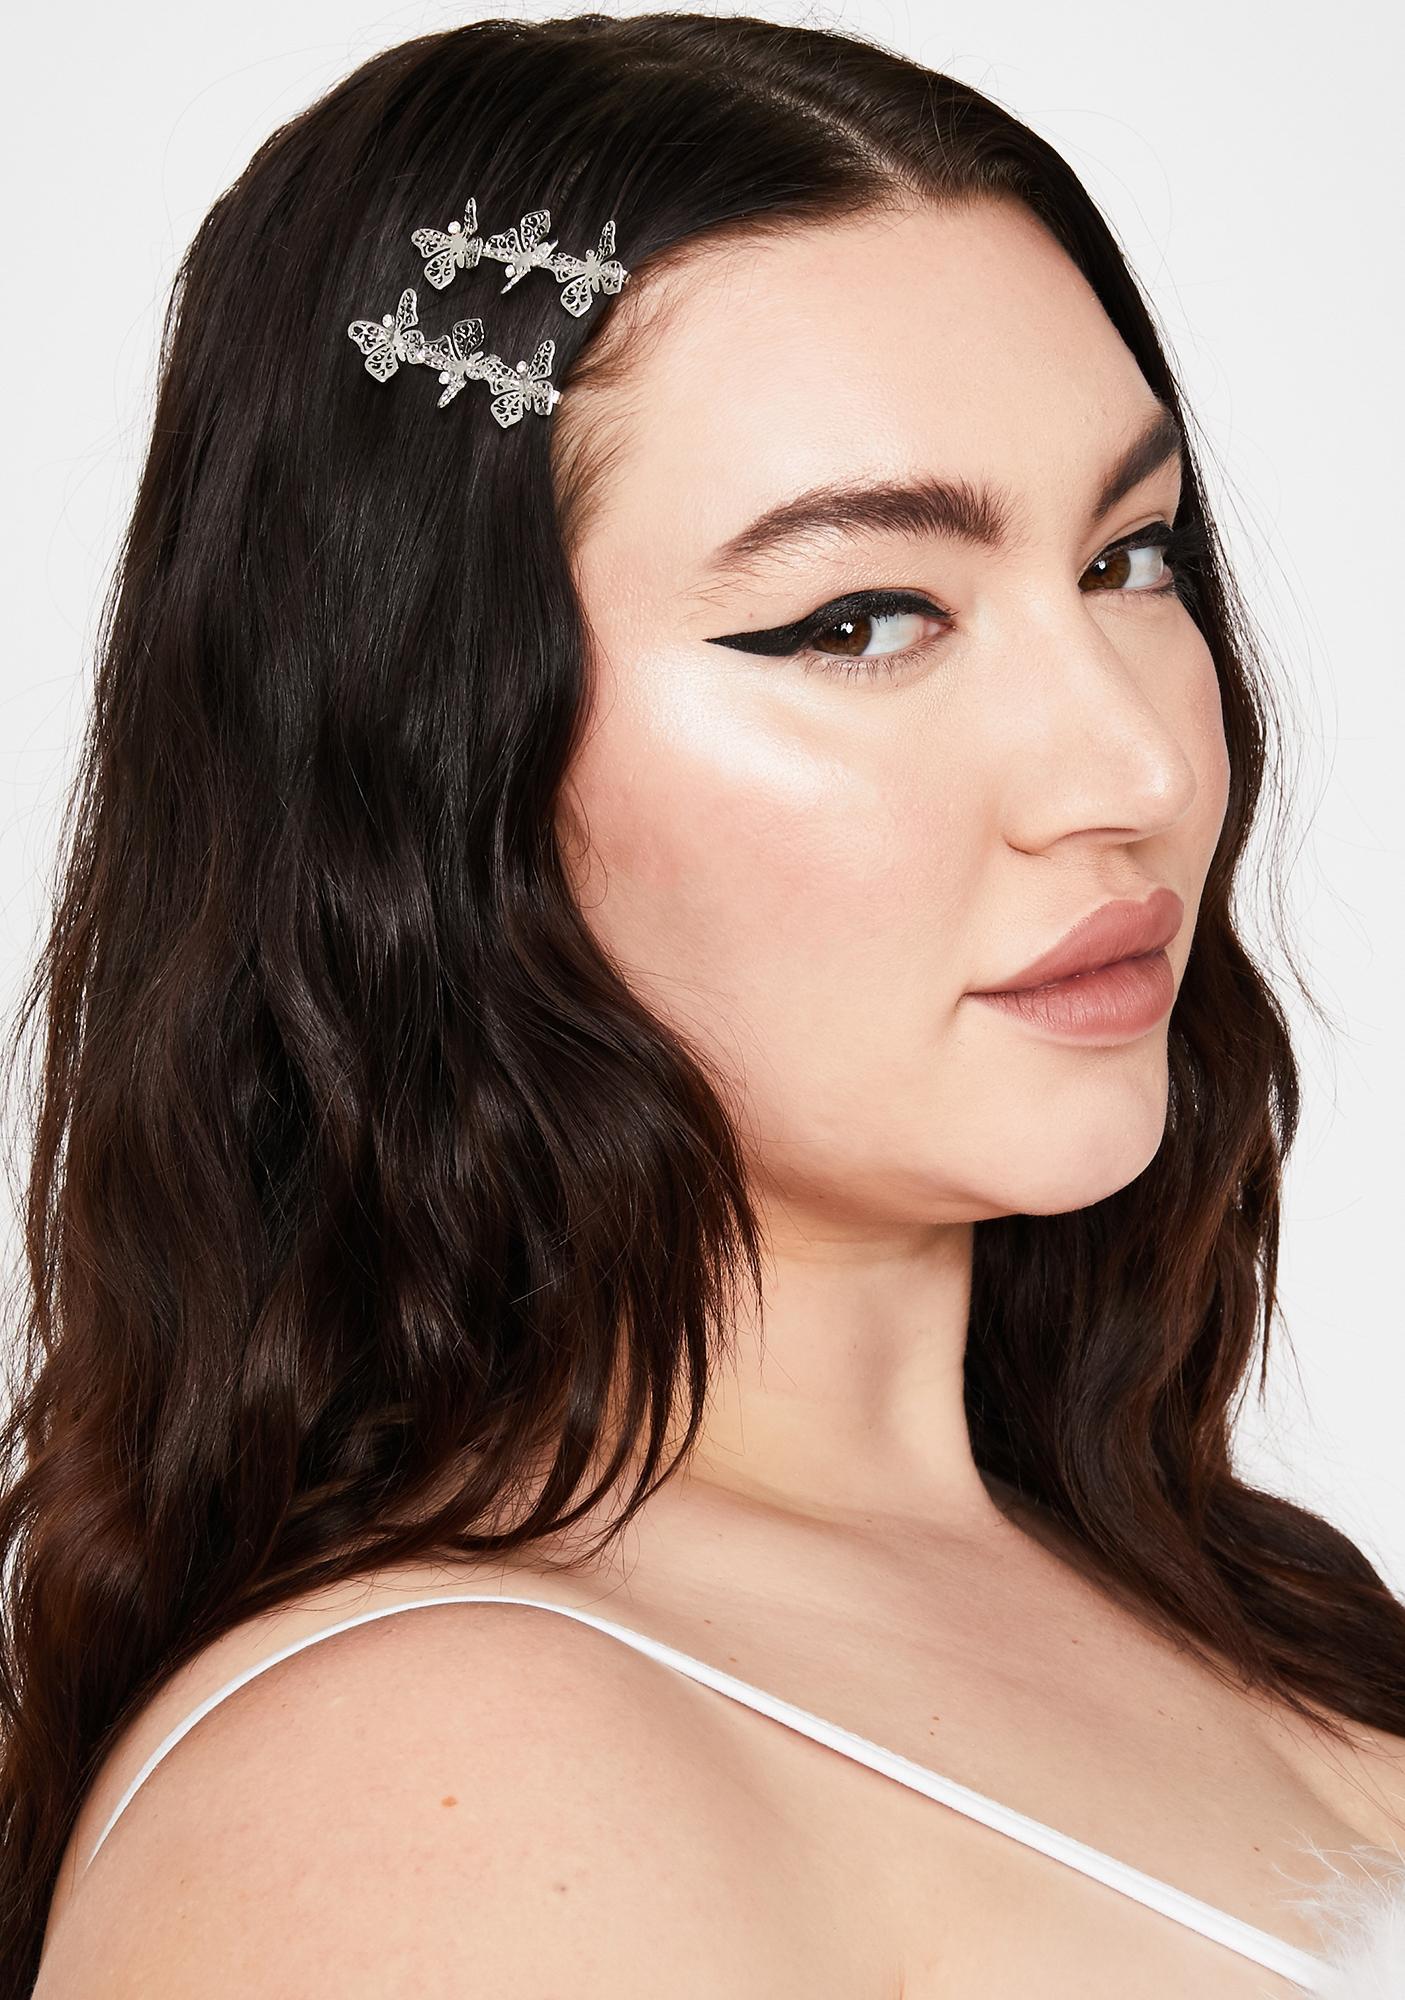 Monarch Mistress Hair Clips